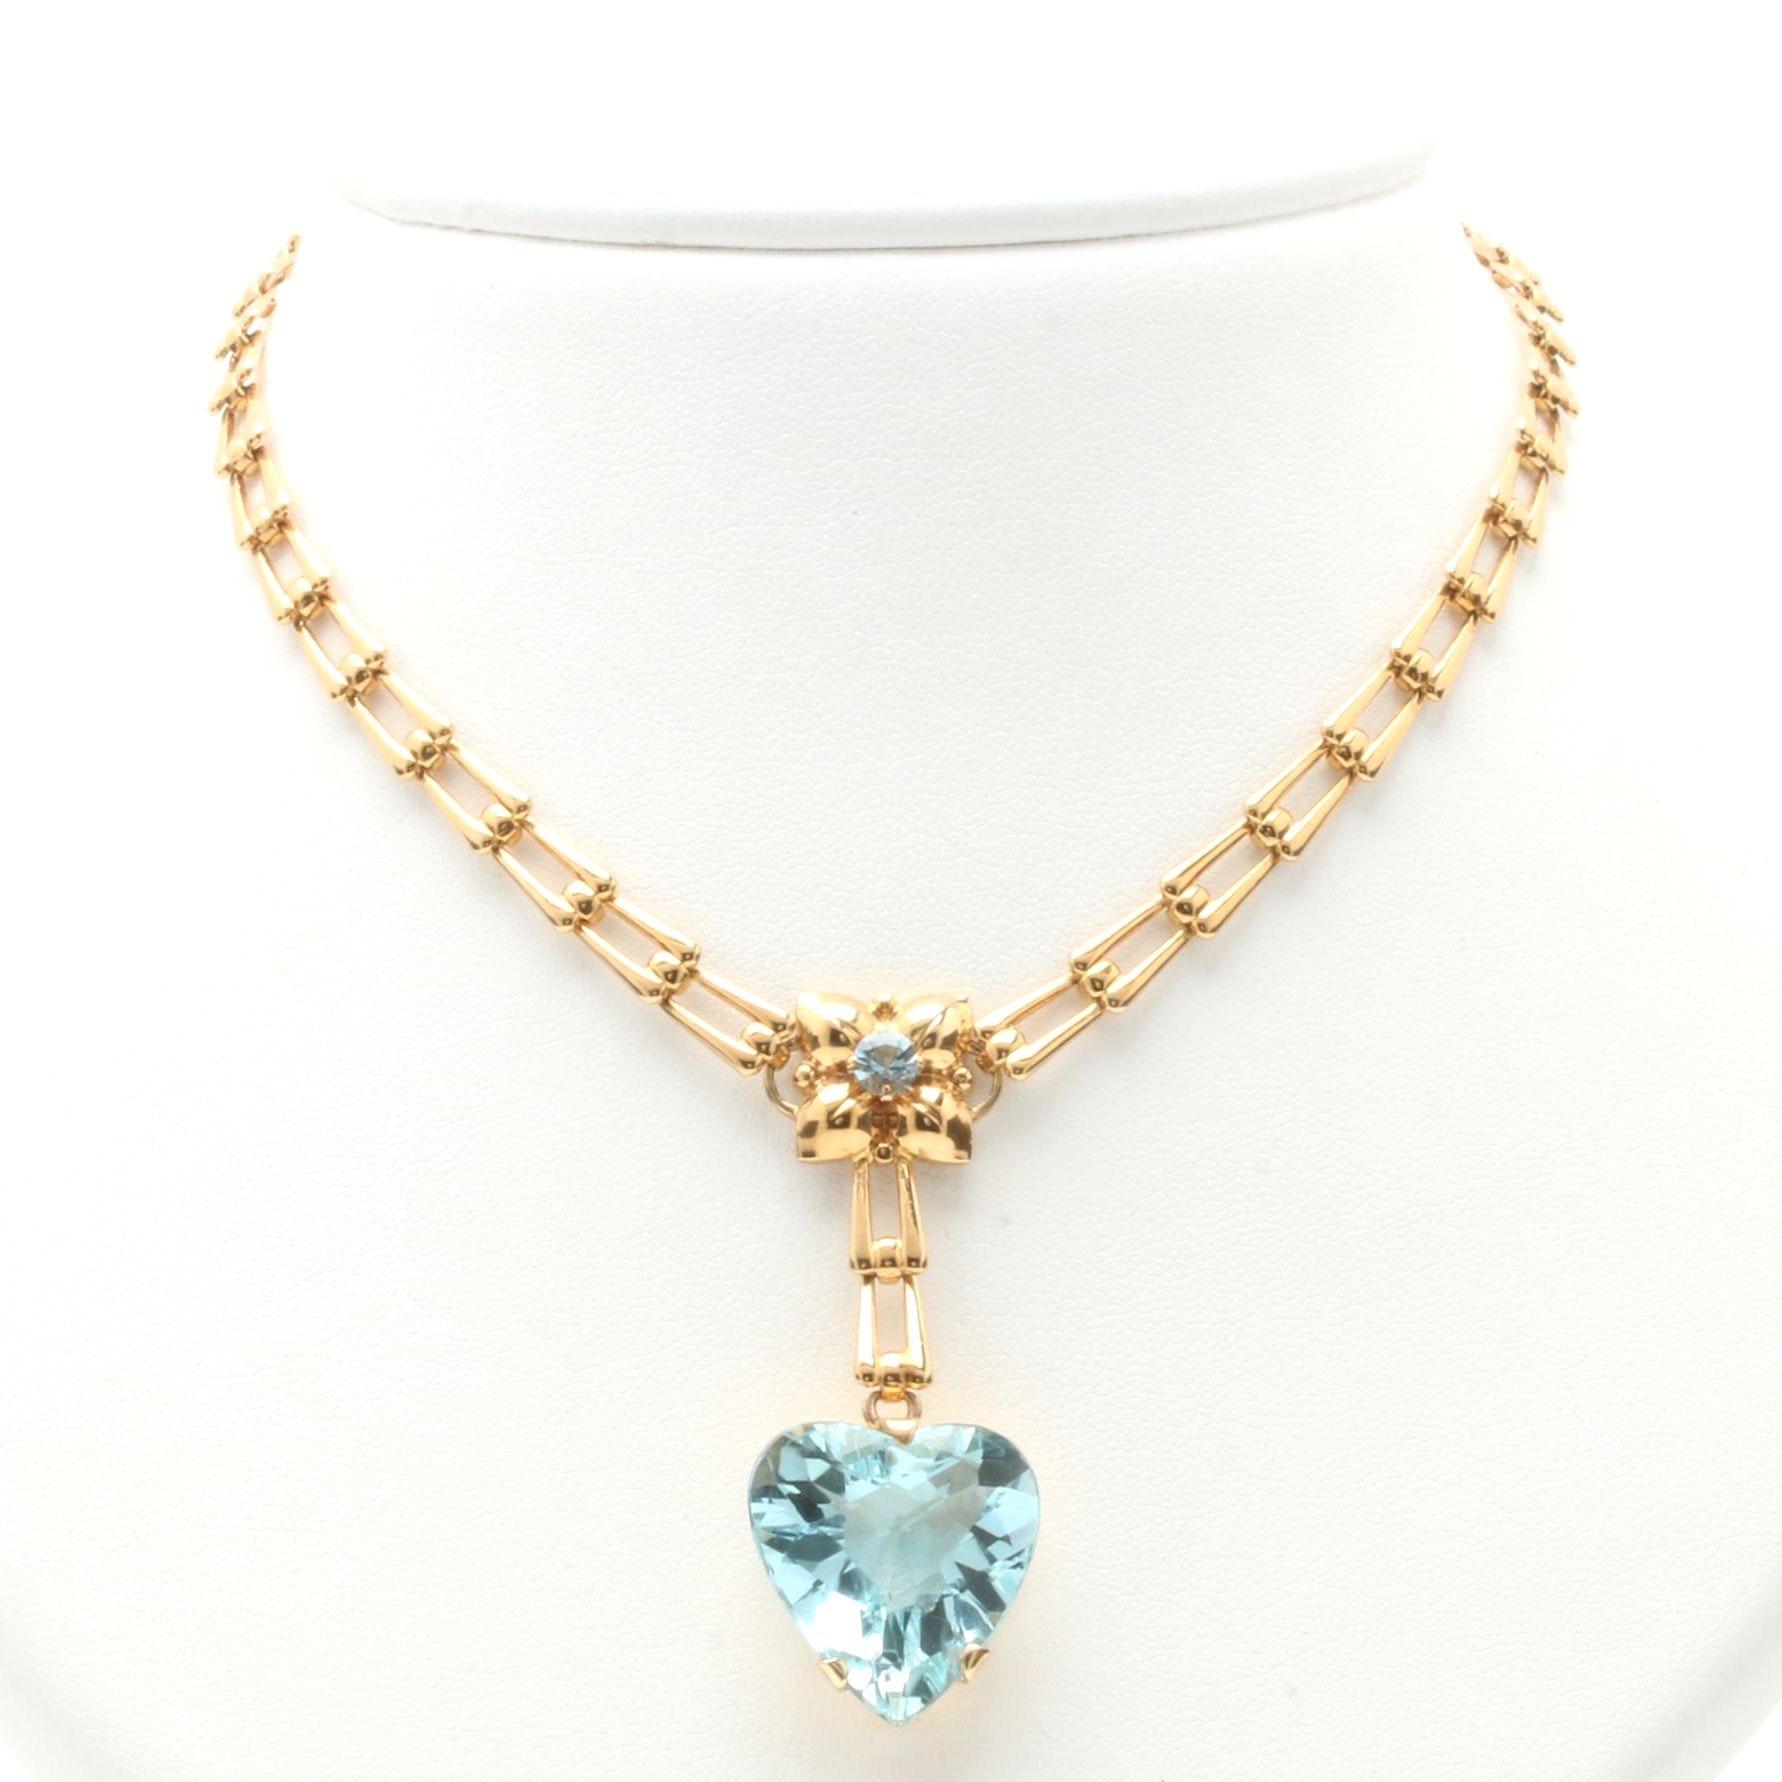 14K Yellow Gold 16.50 CT Aquamarine Heart Pendant Necklace